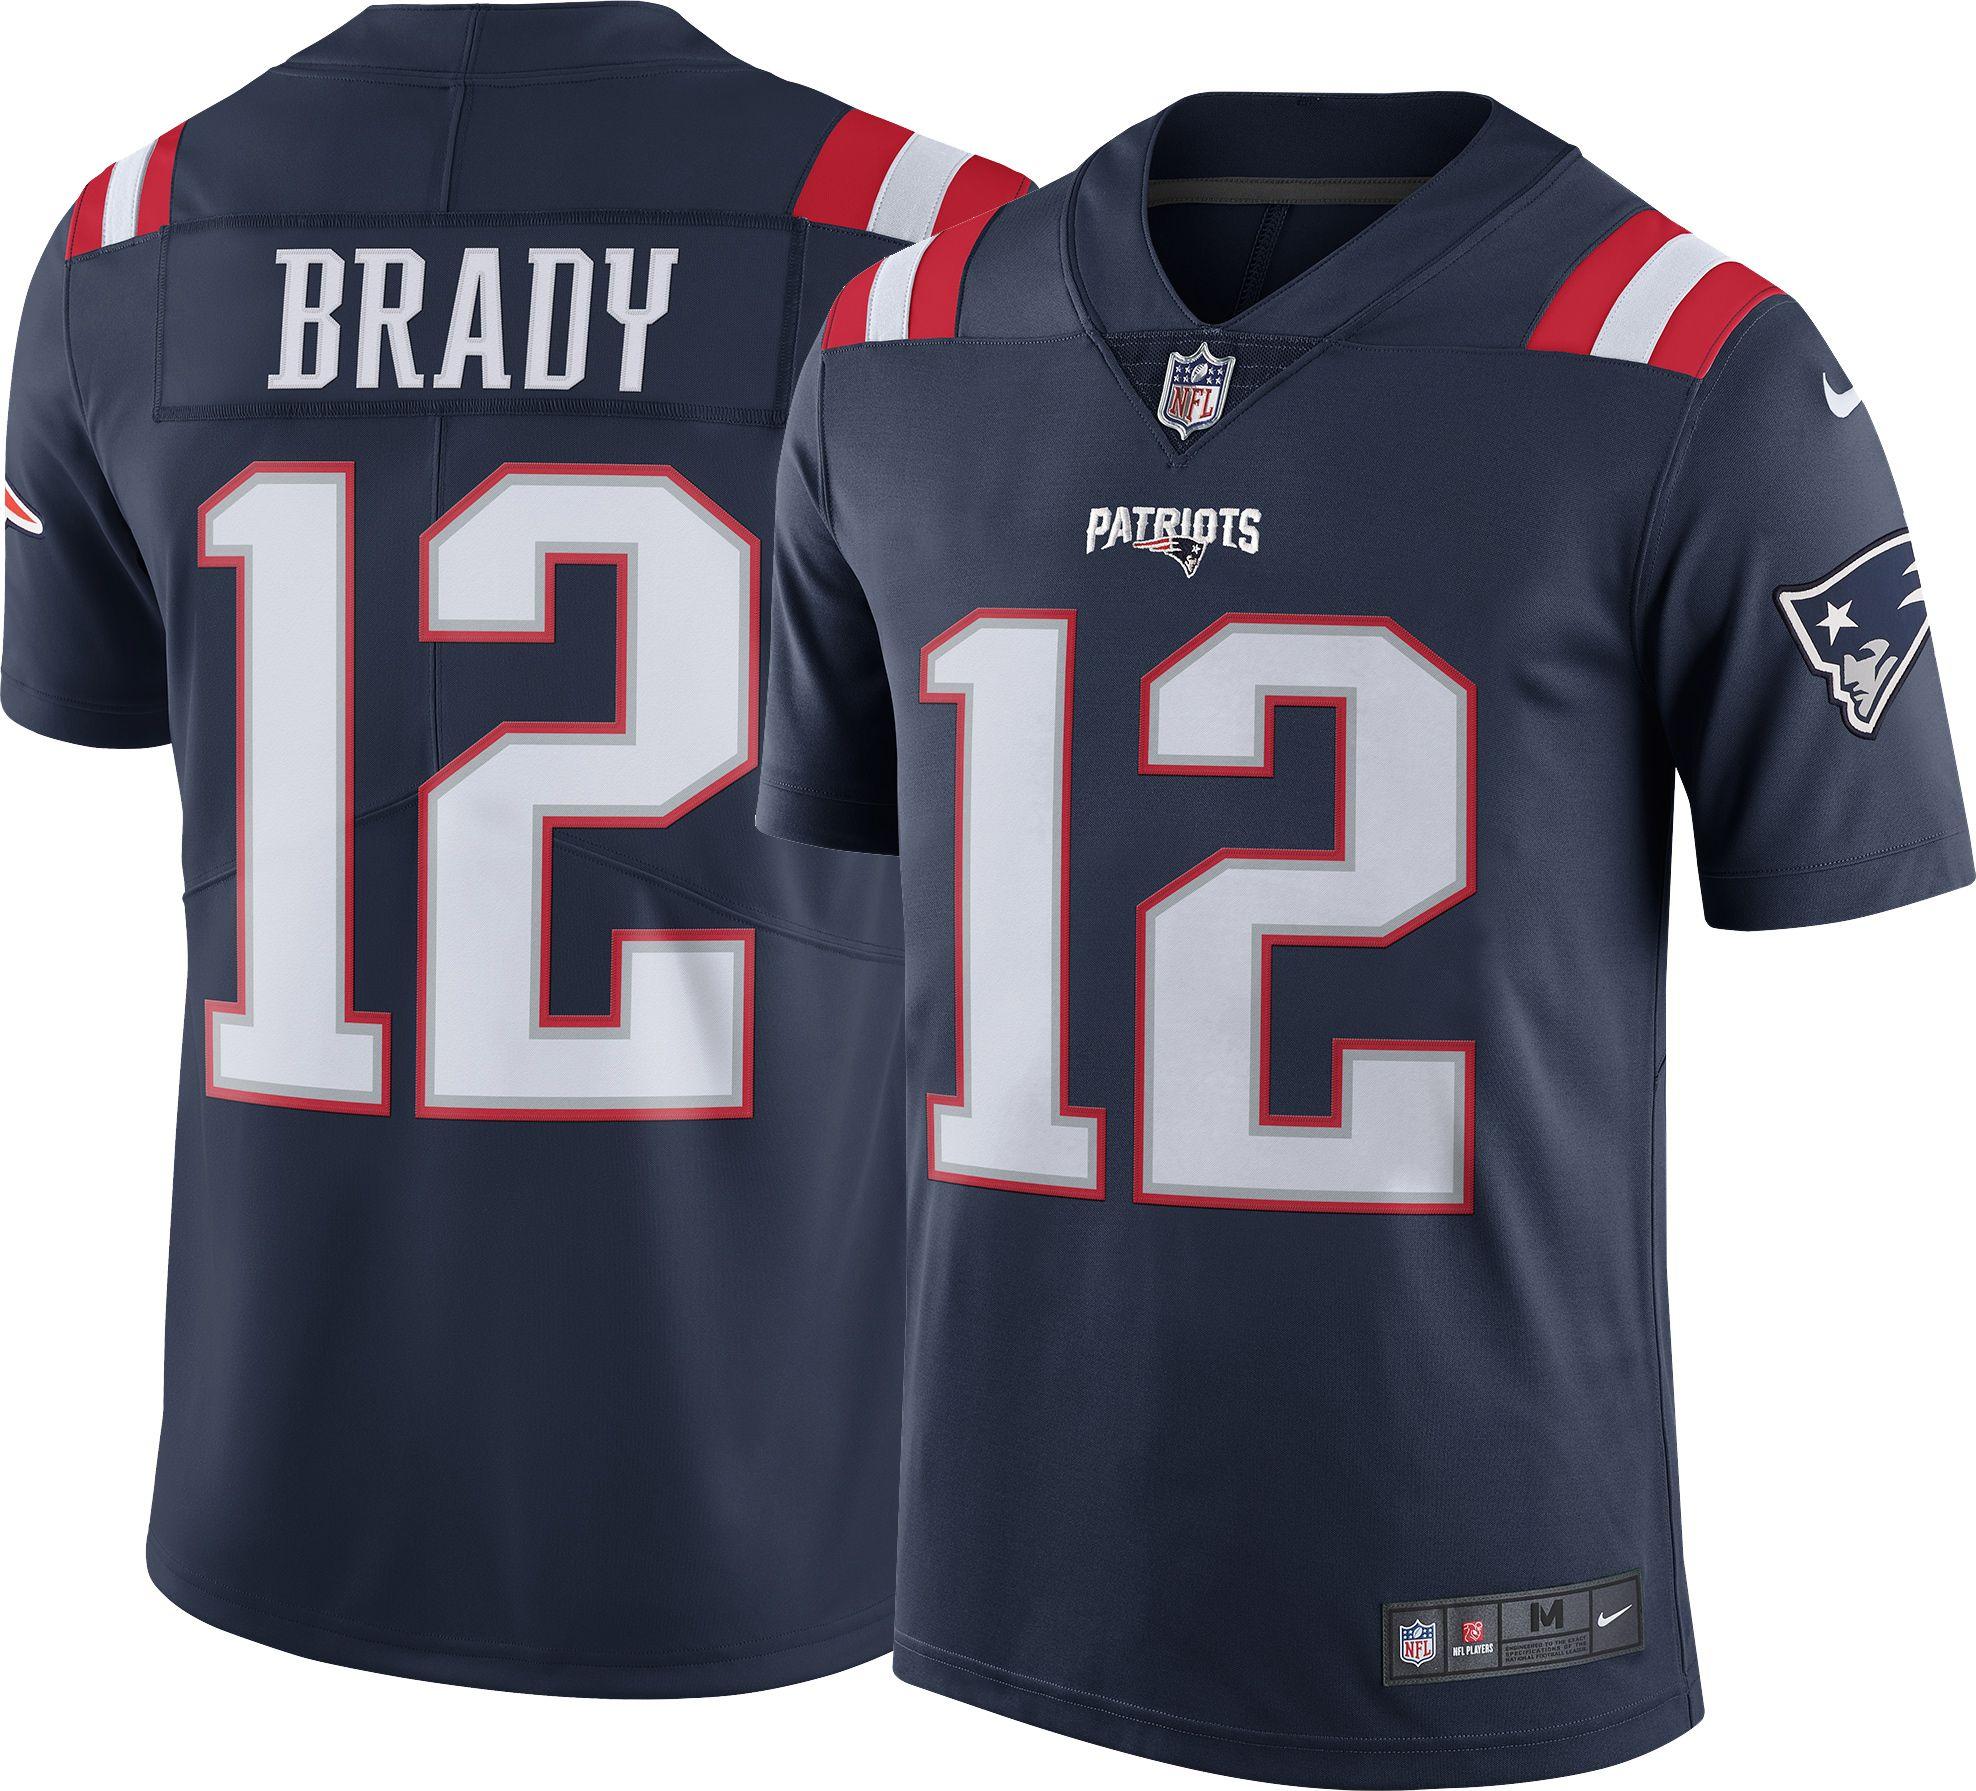 new styles 4c57c 79c80 tom brady jersey price